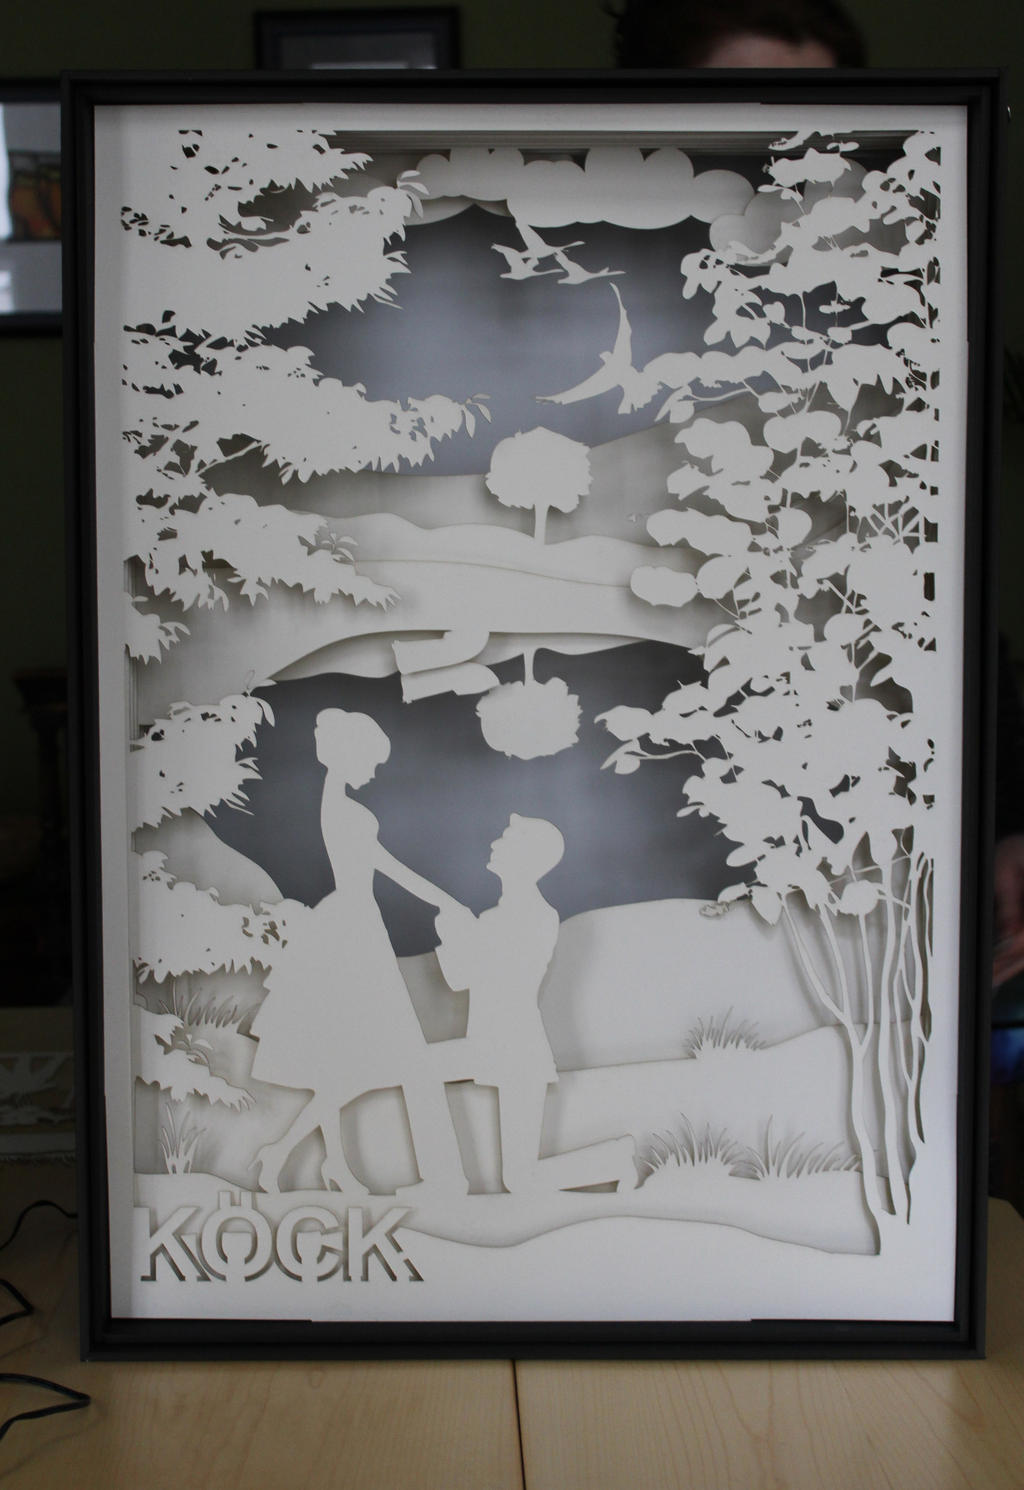 engagement papercut lightbox by clauma on deviantart. Black Bedroom Furniture Sets. Home Design Ideas